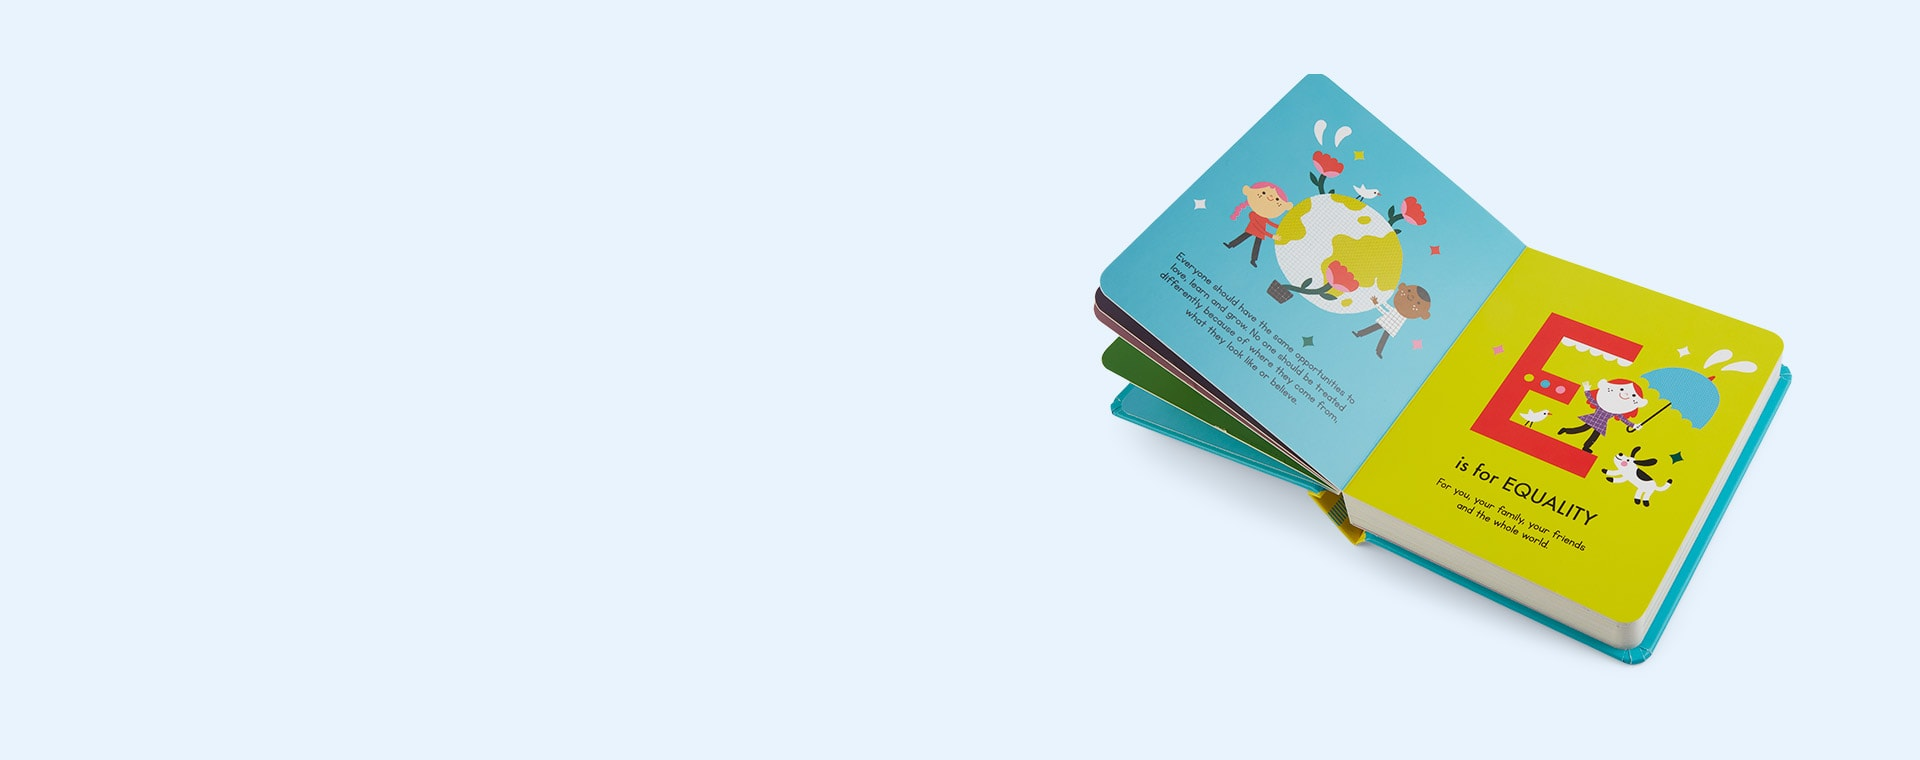 Multi bookspeed ABC Of Equality